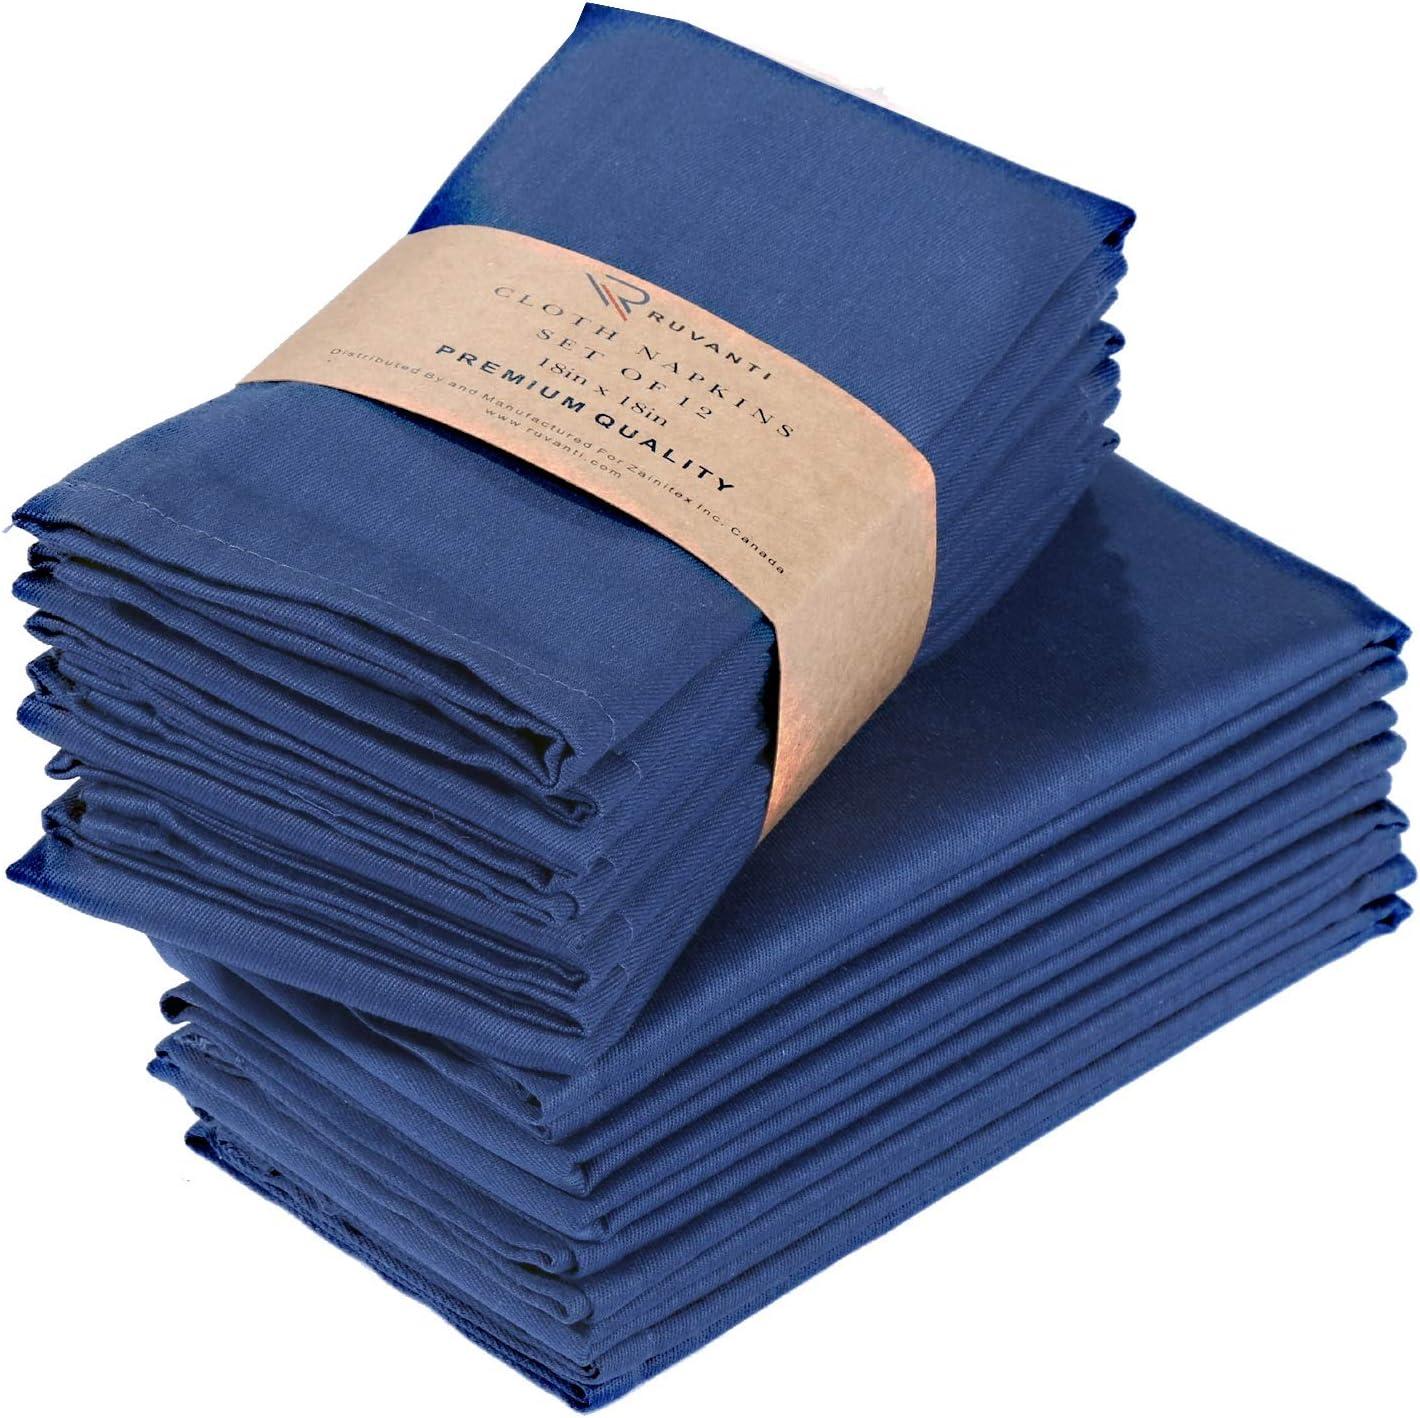 "Ruvanti Cotton Dinner Napkins 12 Pack (18"" X18""), Cloth Napkins Soft and Comfortable Reusable Napkins - Durable Linen Napkins - Perfect Table Napkins/Navy Blue Napkins for Family Dinners, Weddings."